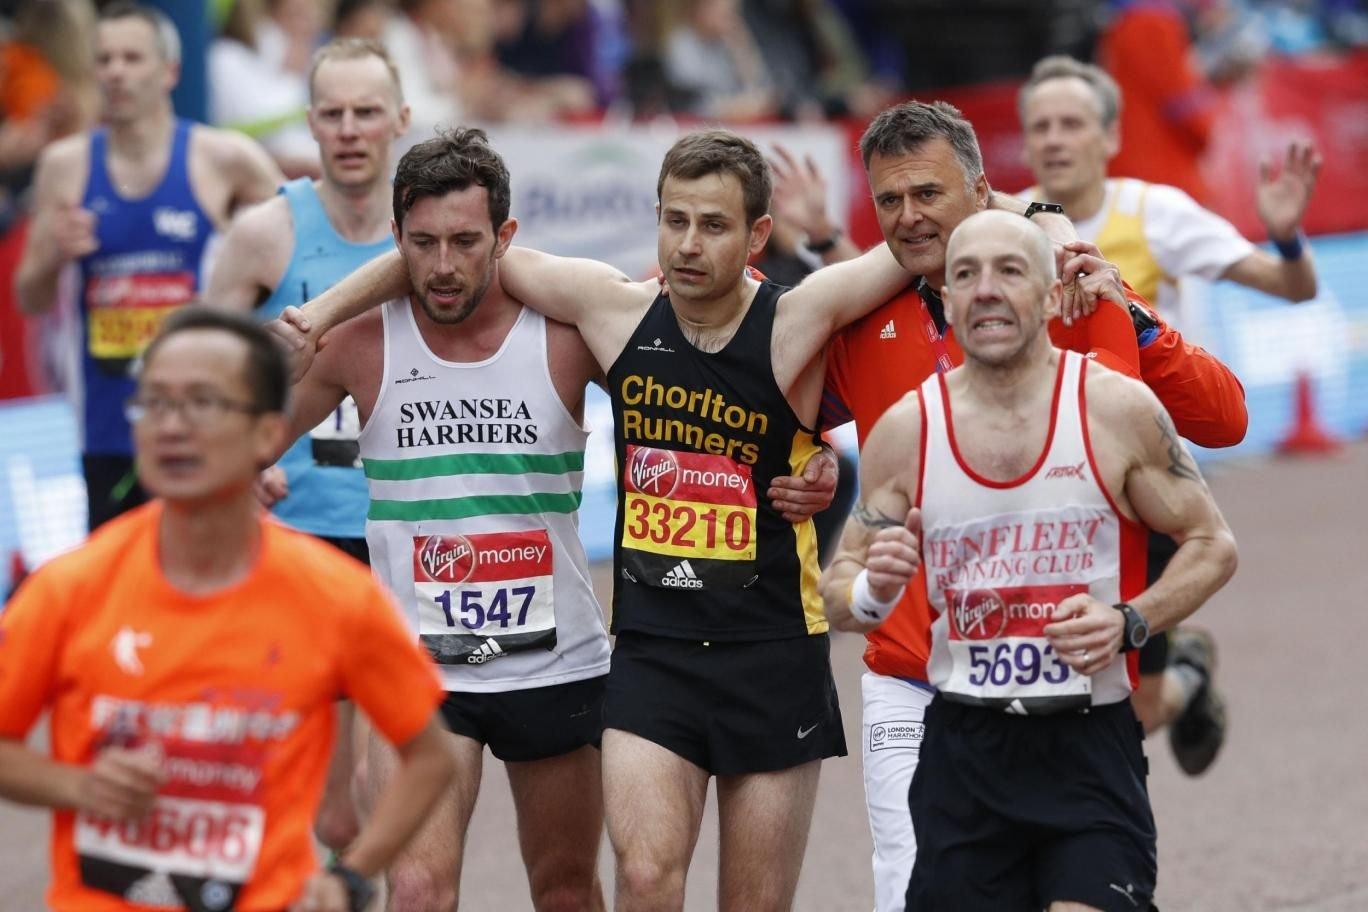 Лондонский марафон: бегун дотащил конкурента до финиша +Видео